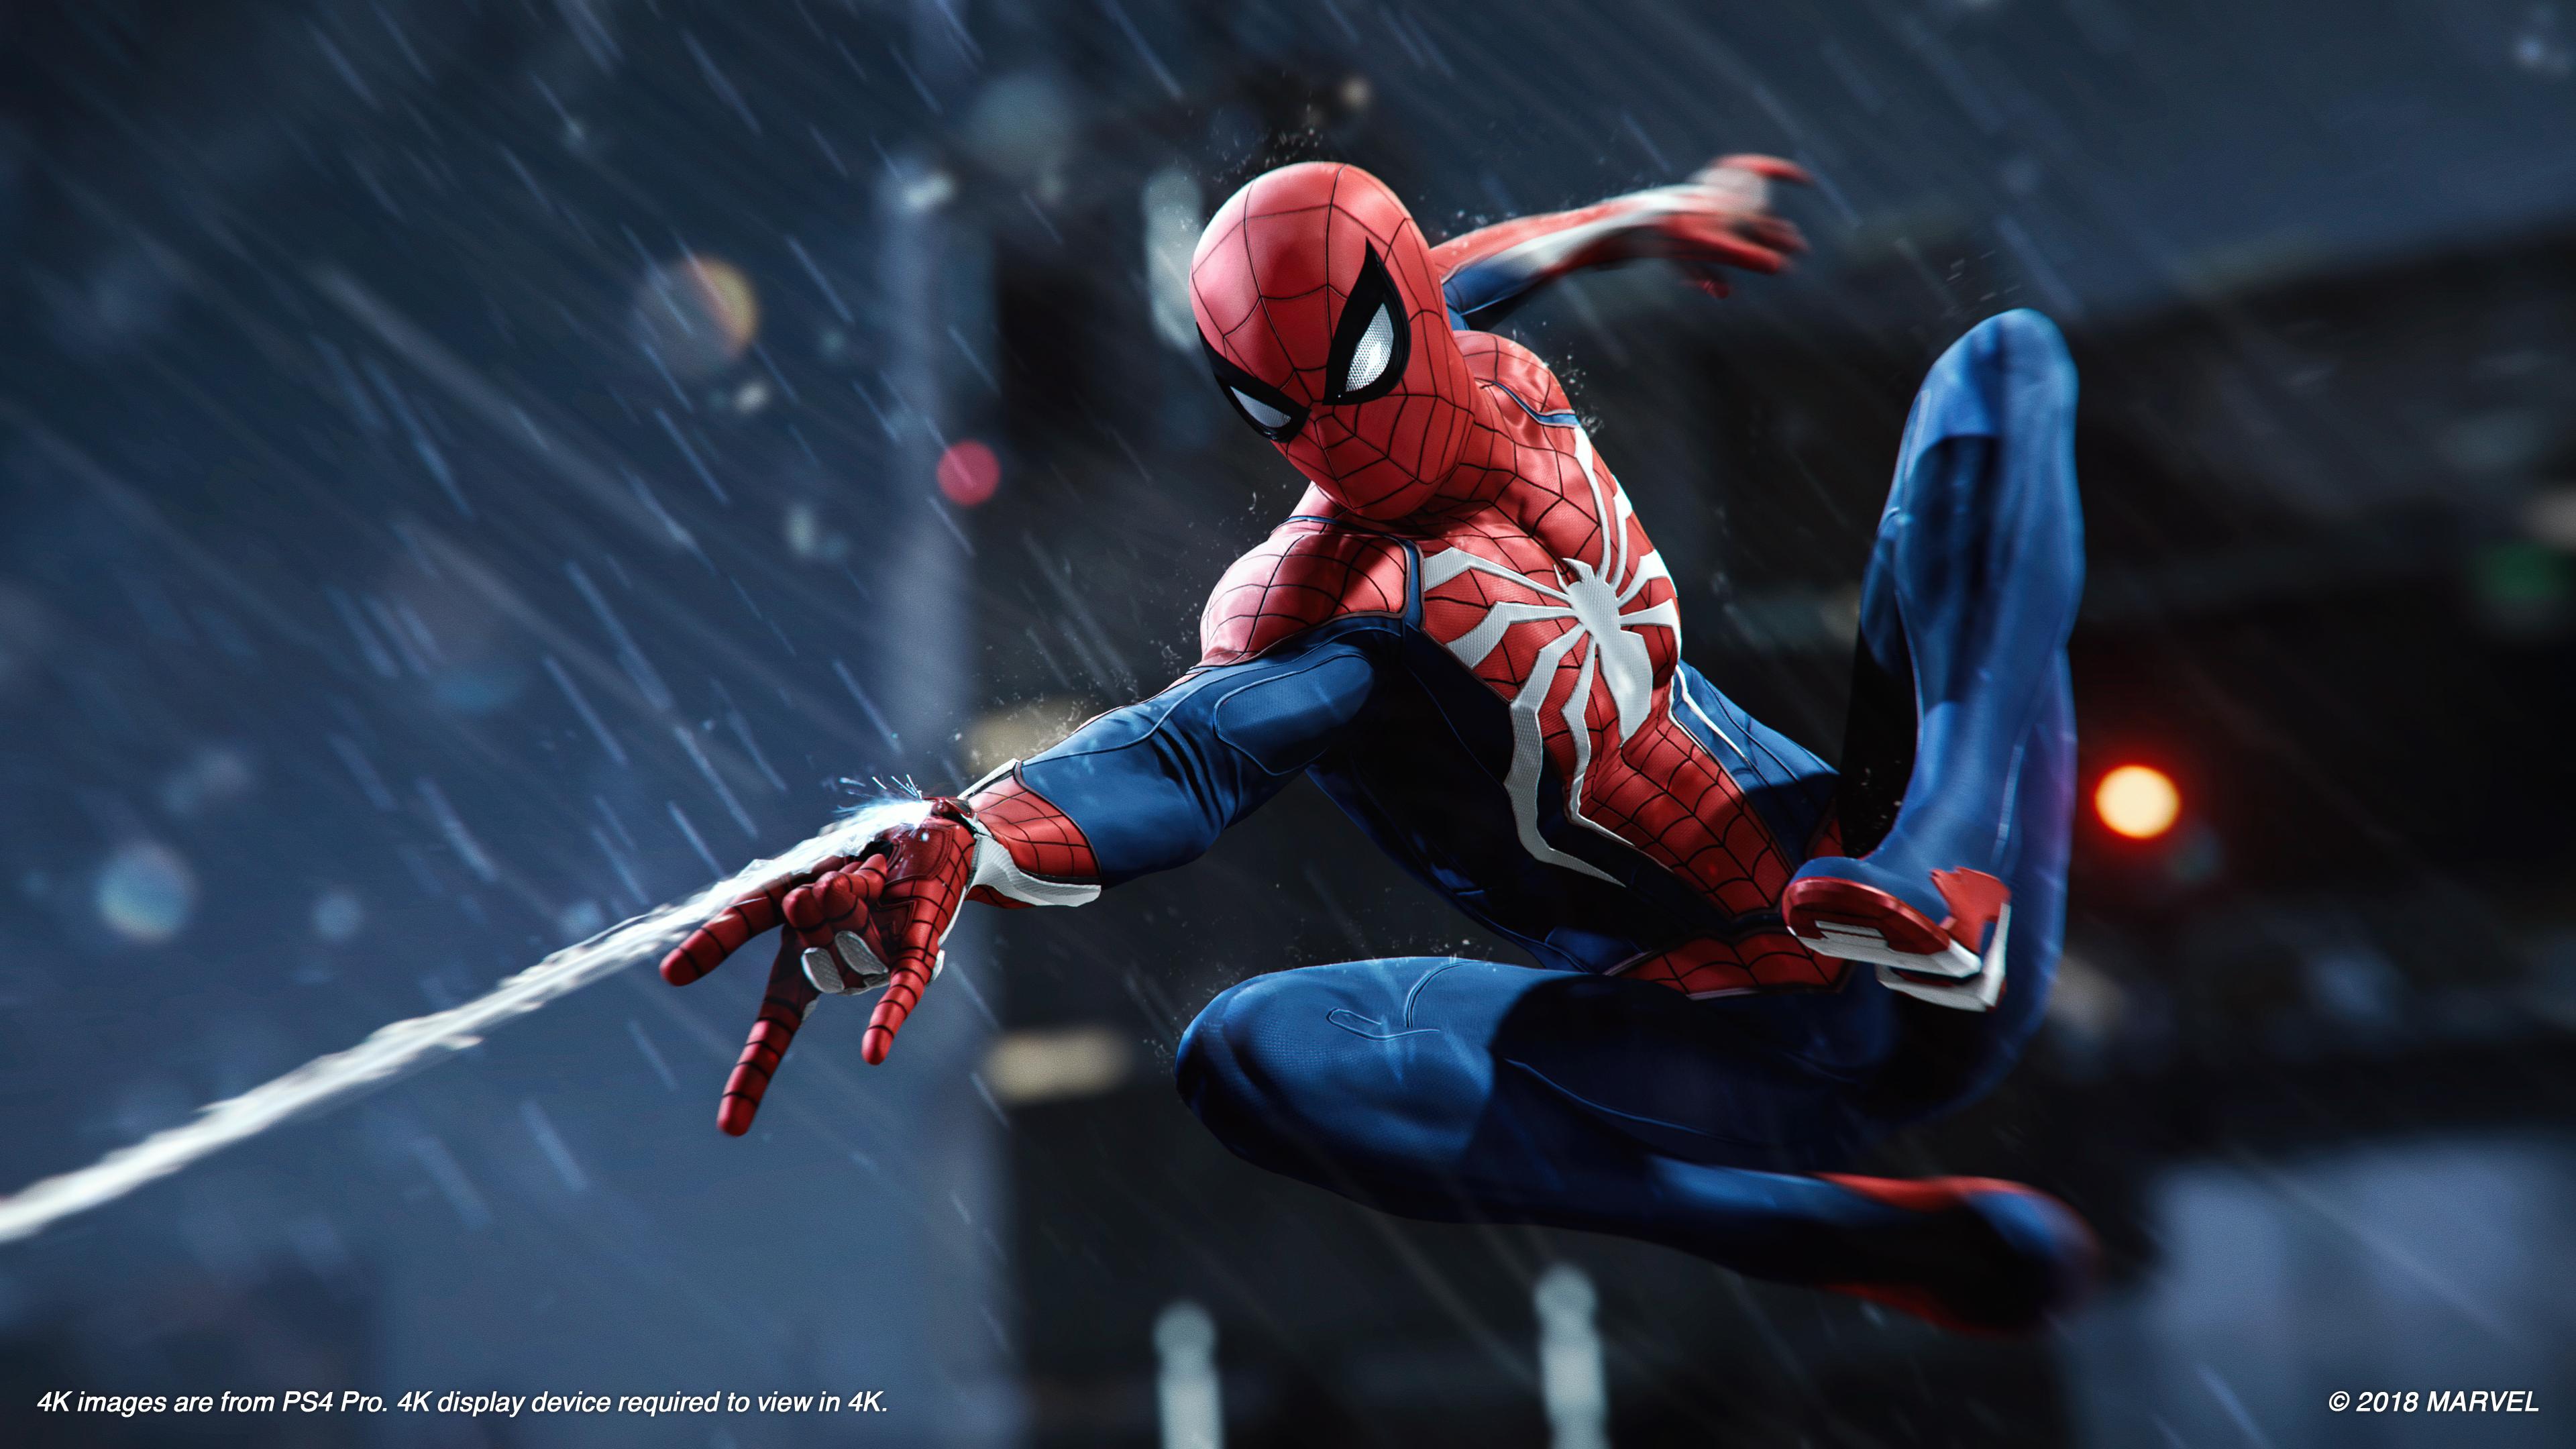 8ffb8f505ca40892bf3a0c95e3a624e4.jpg - Marvel's Spider-Man